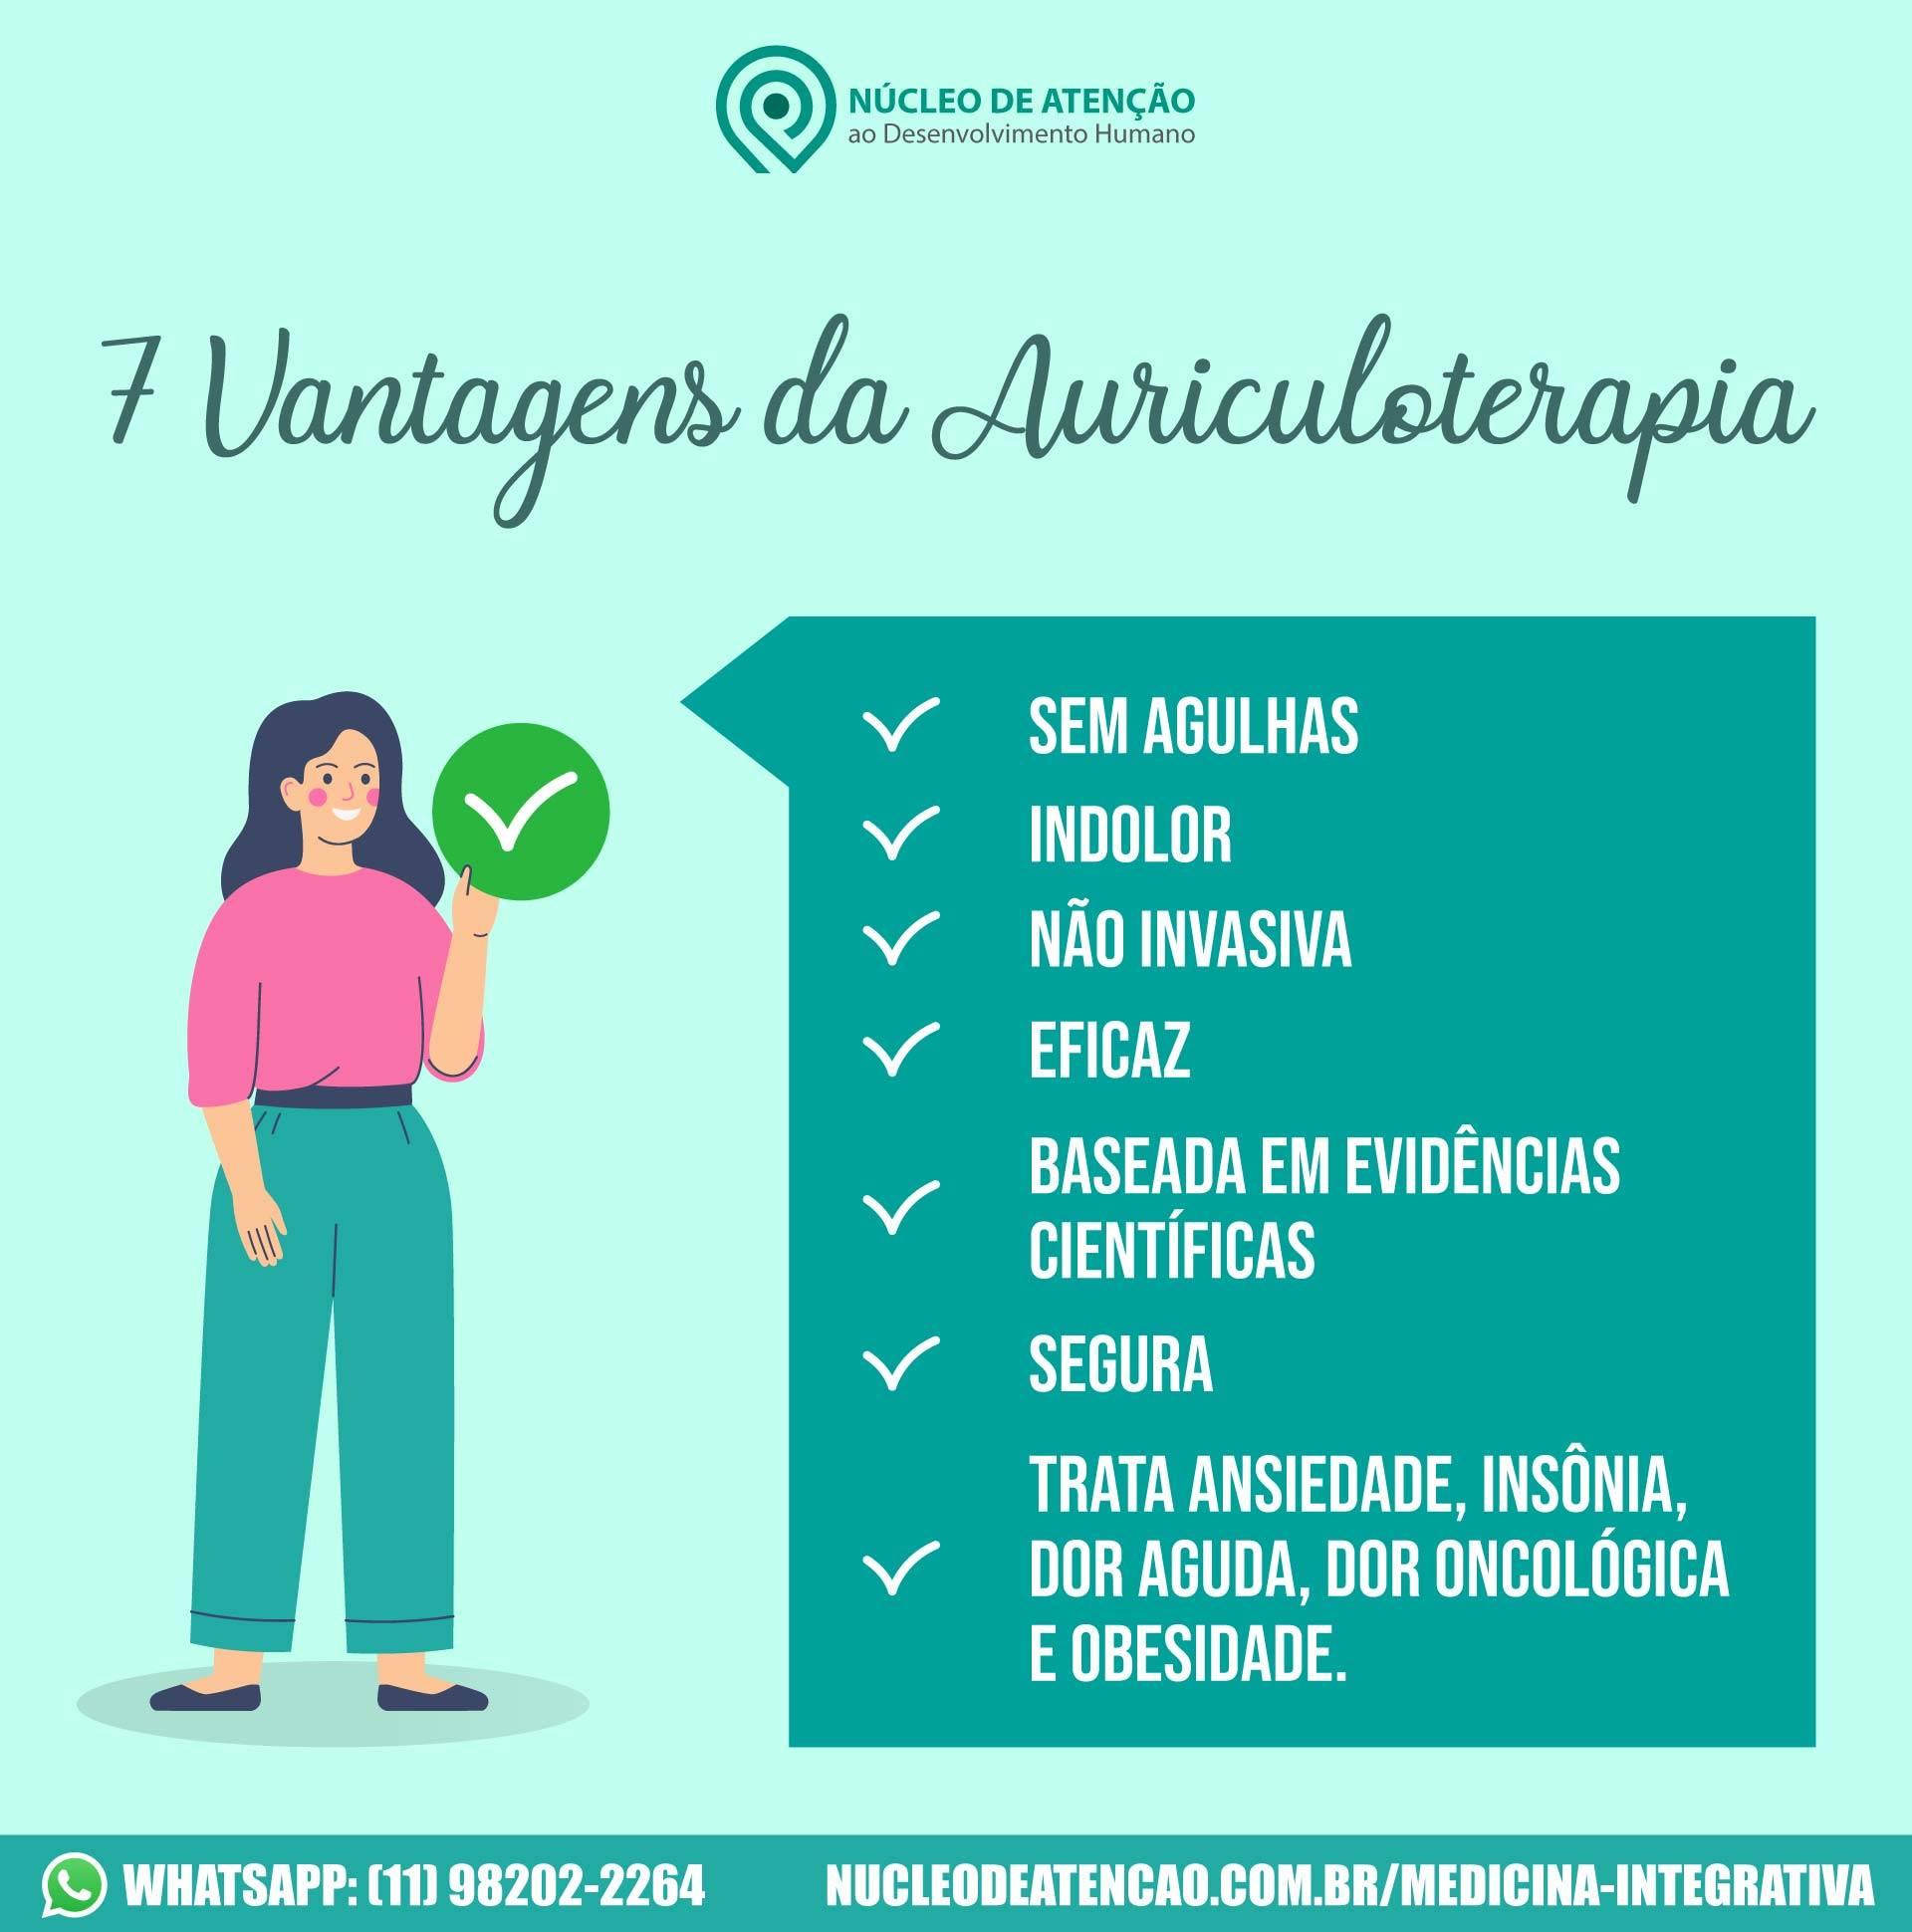 7 Vantagens da Auriculoterapia